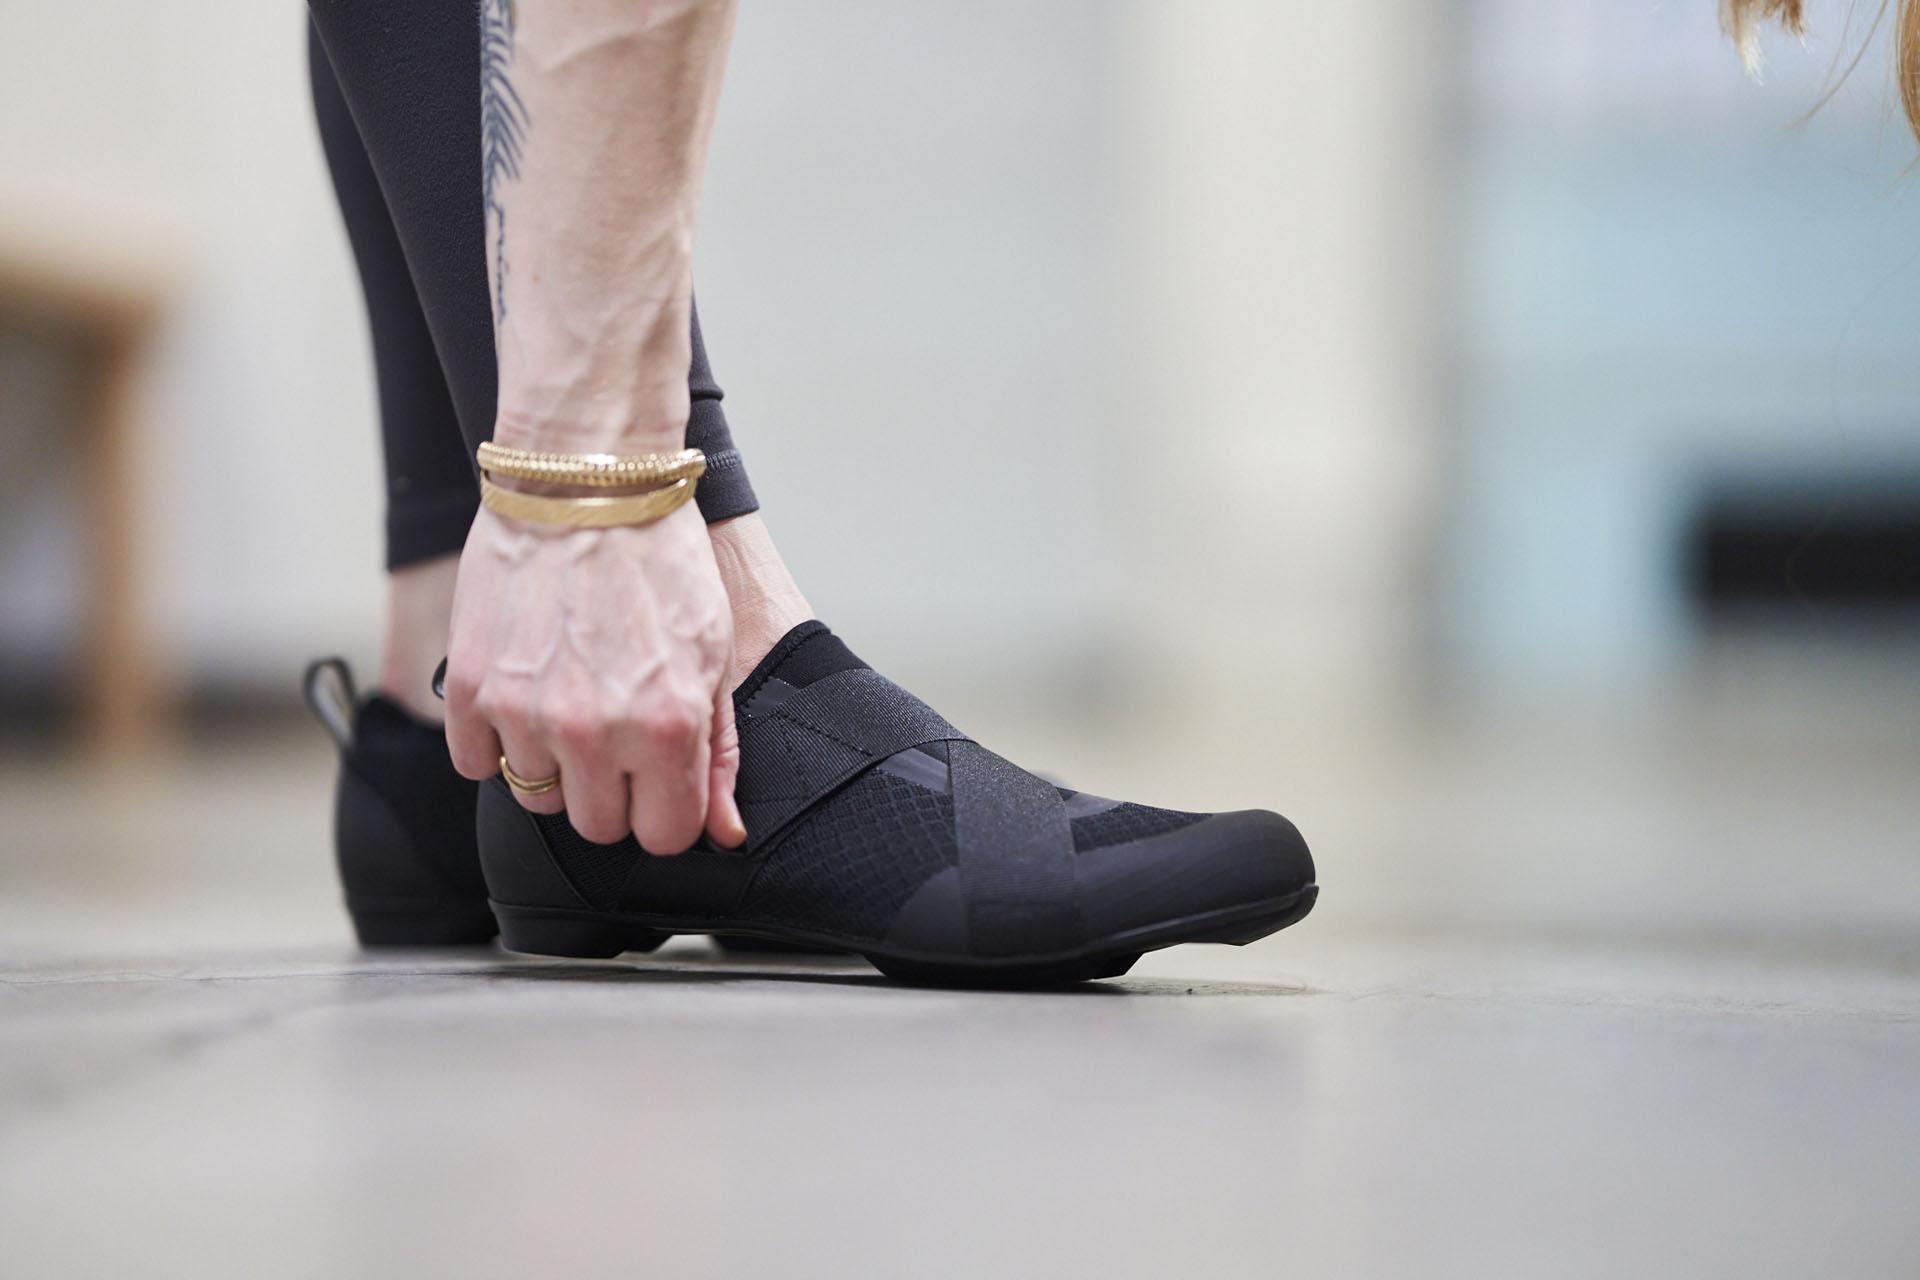 chaussures-velo-shimano-indorr-210306-0009.jpg